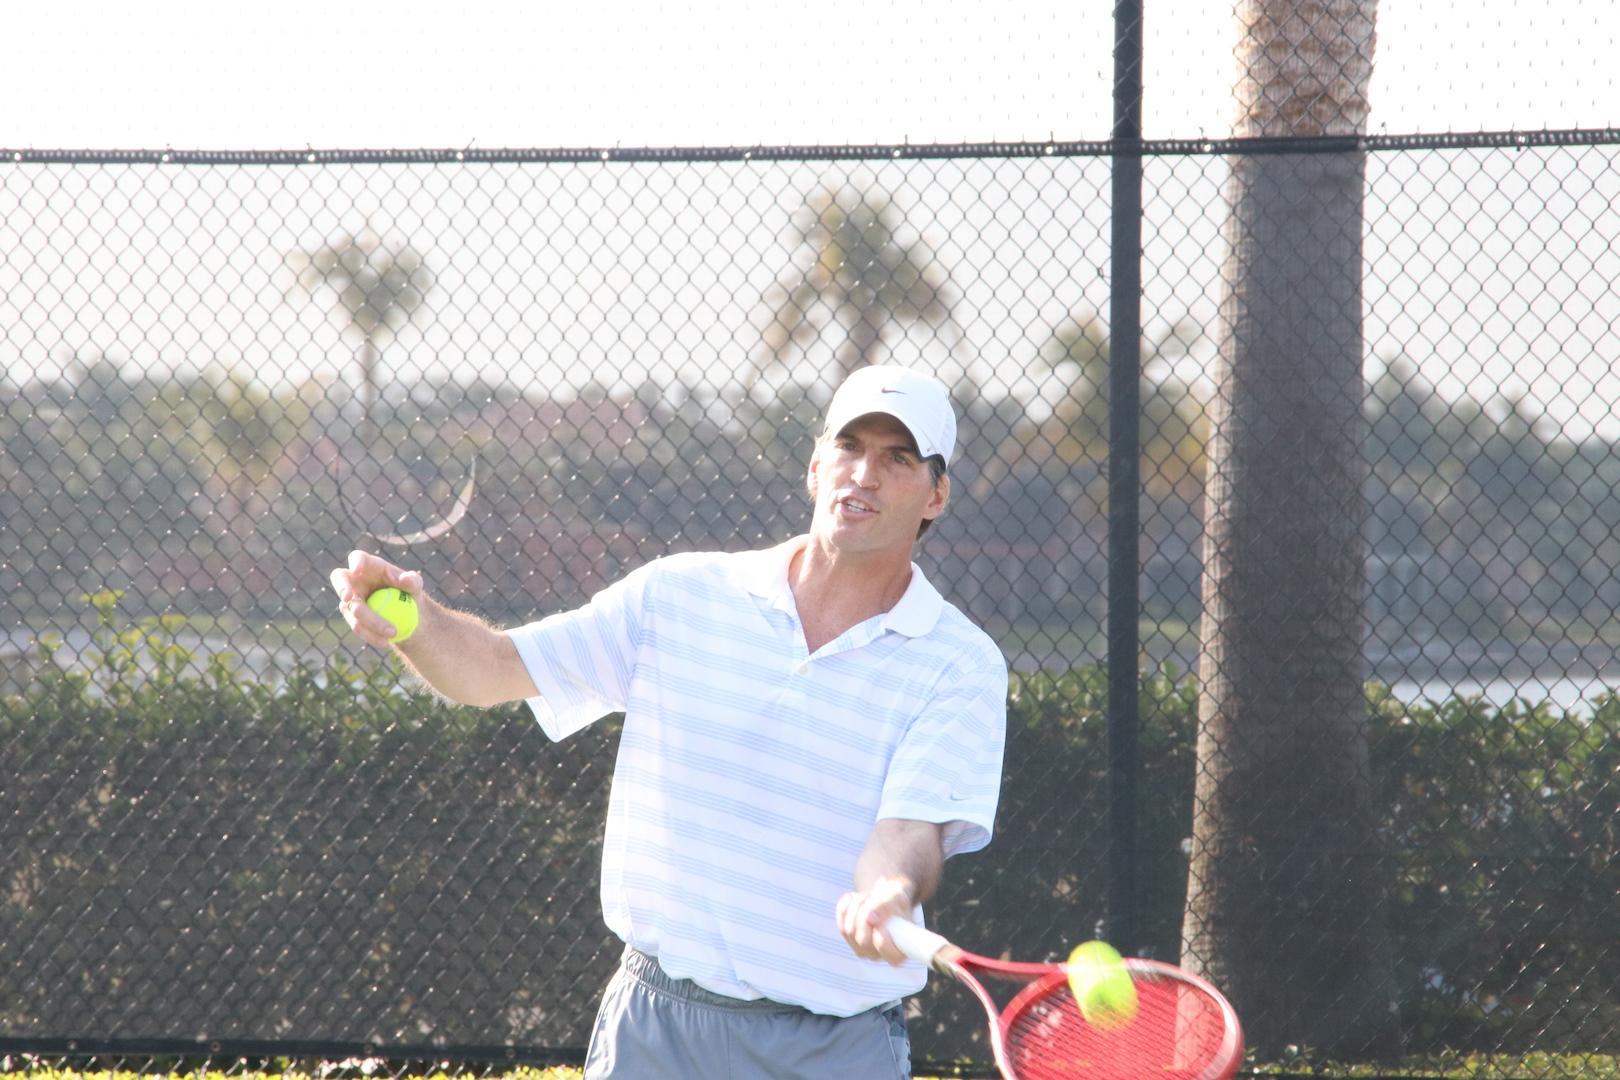 tennis-donJohnson.JPG